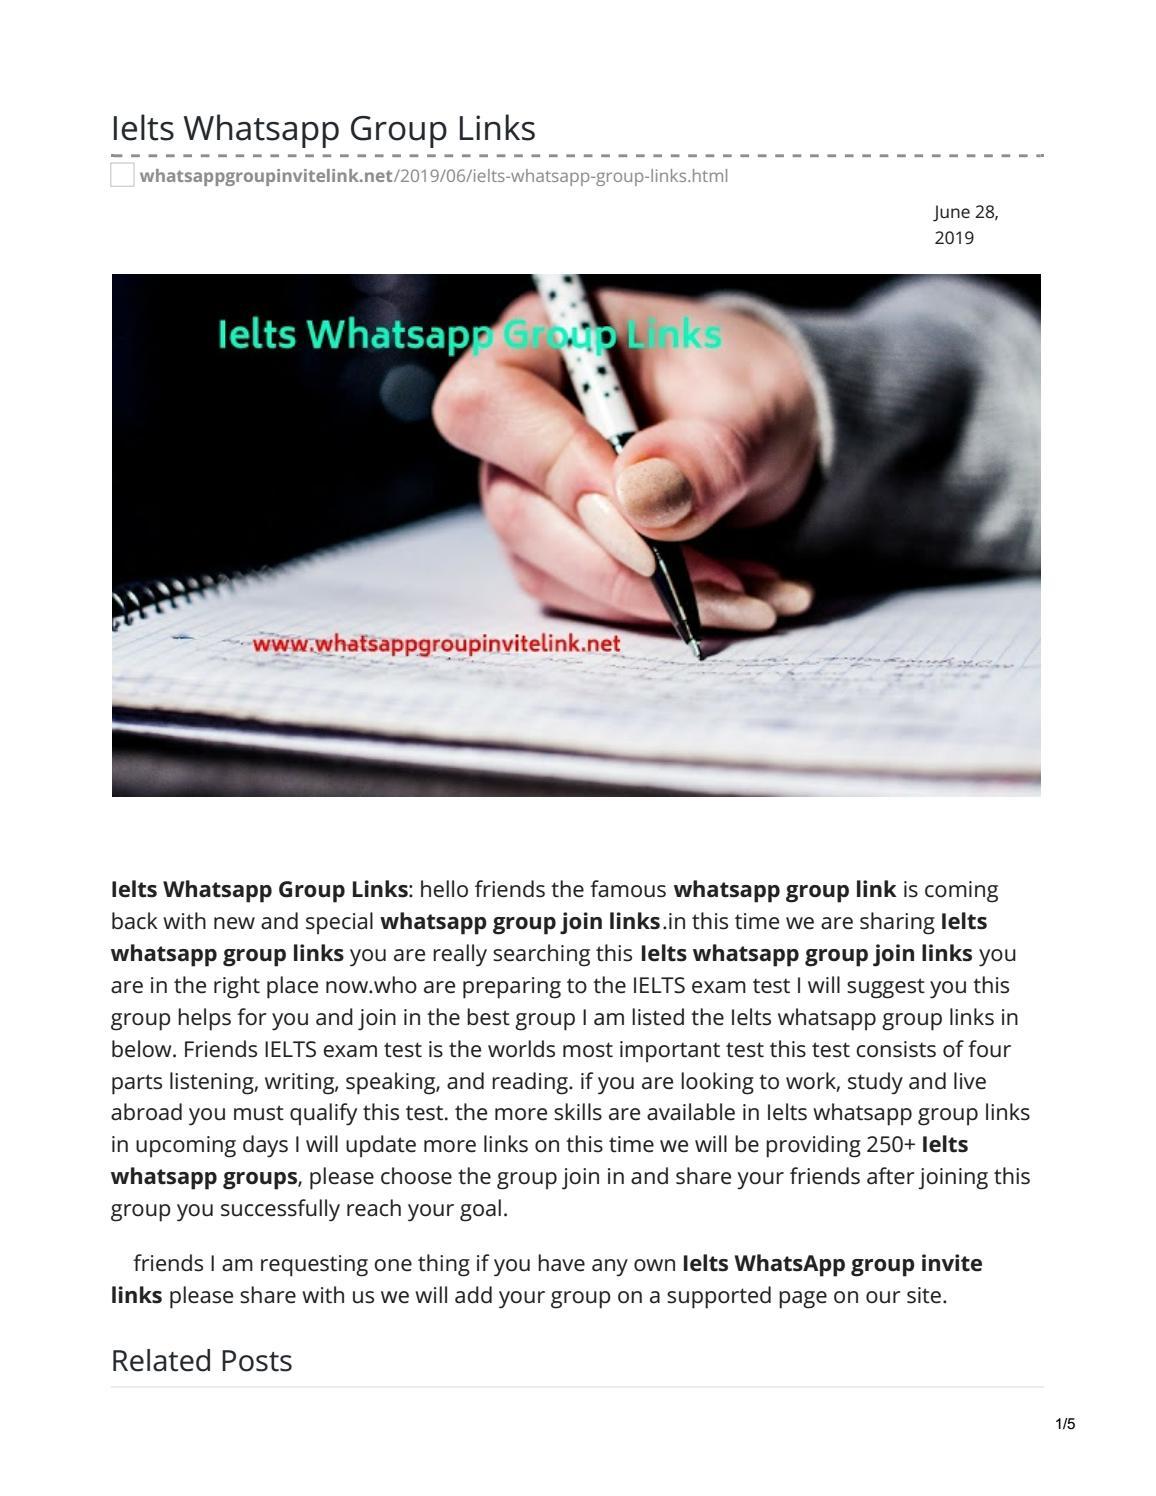 Ielts Whatsapp Group Links by whatsappgrouplink77 - issuu